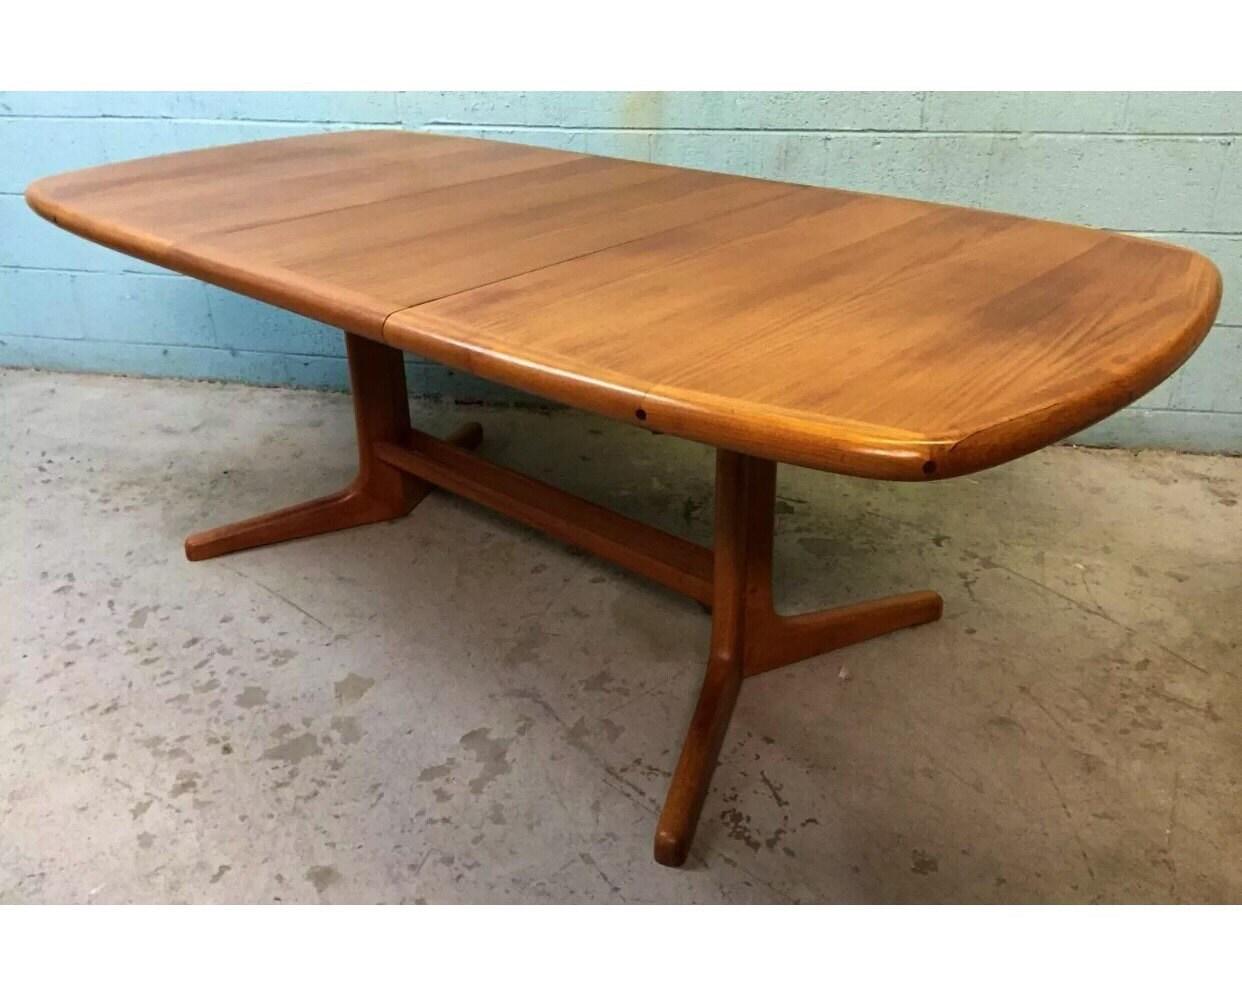 High Quality Mid Century Danish Modern Teak Dining Table